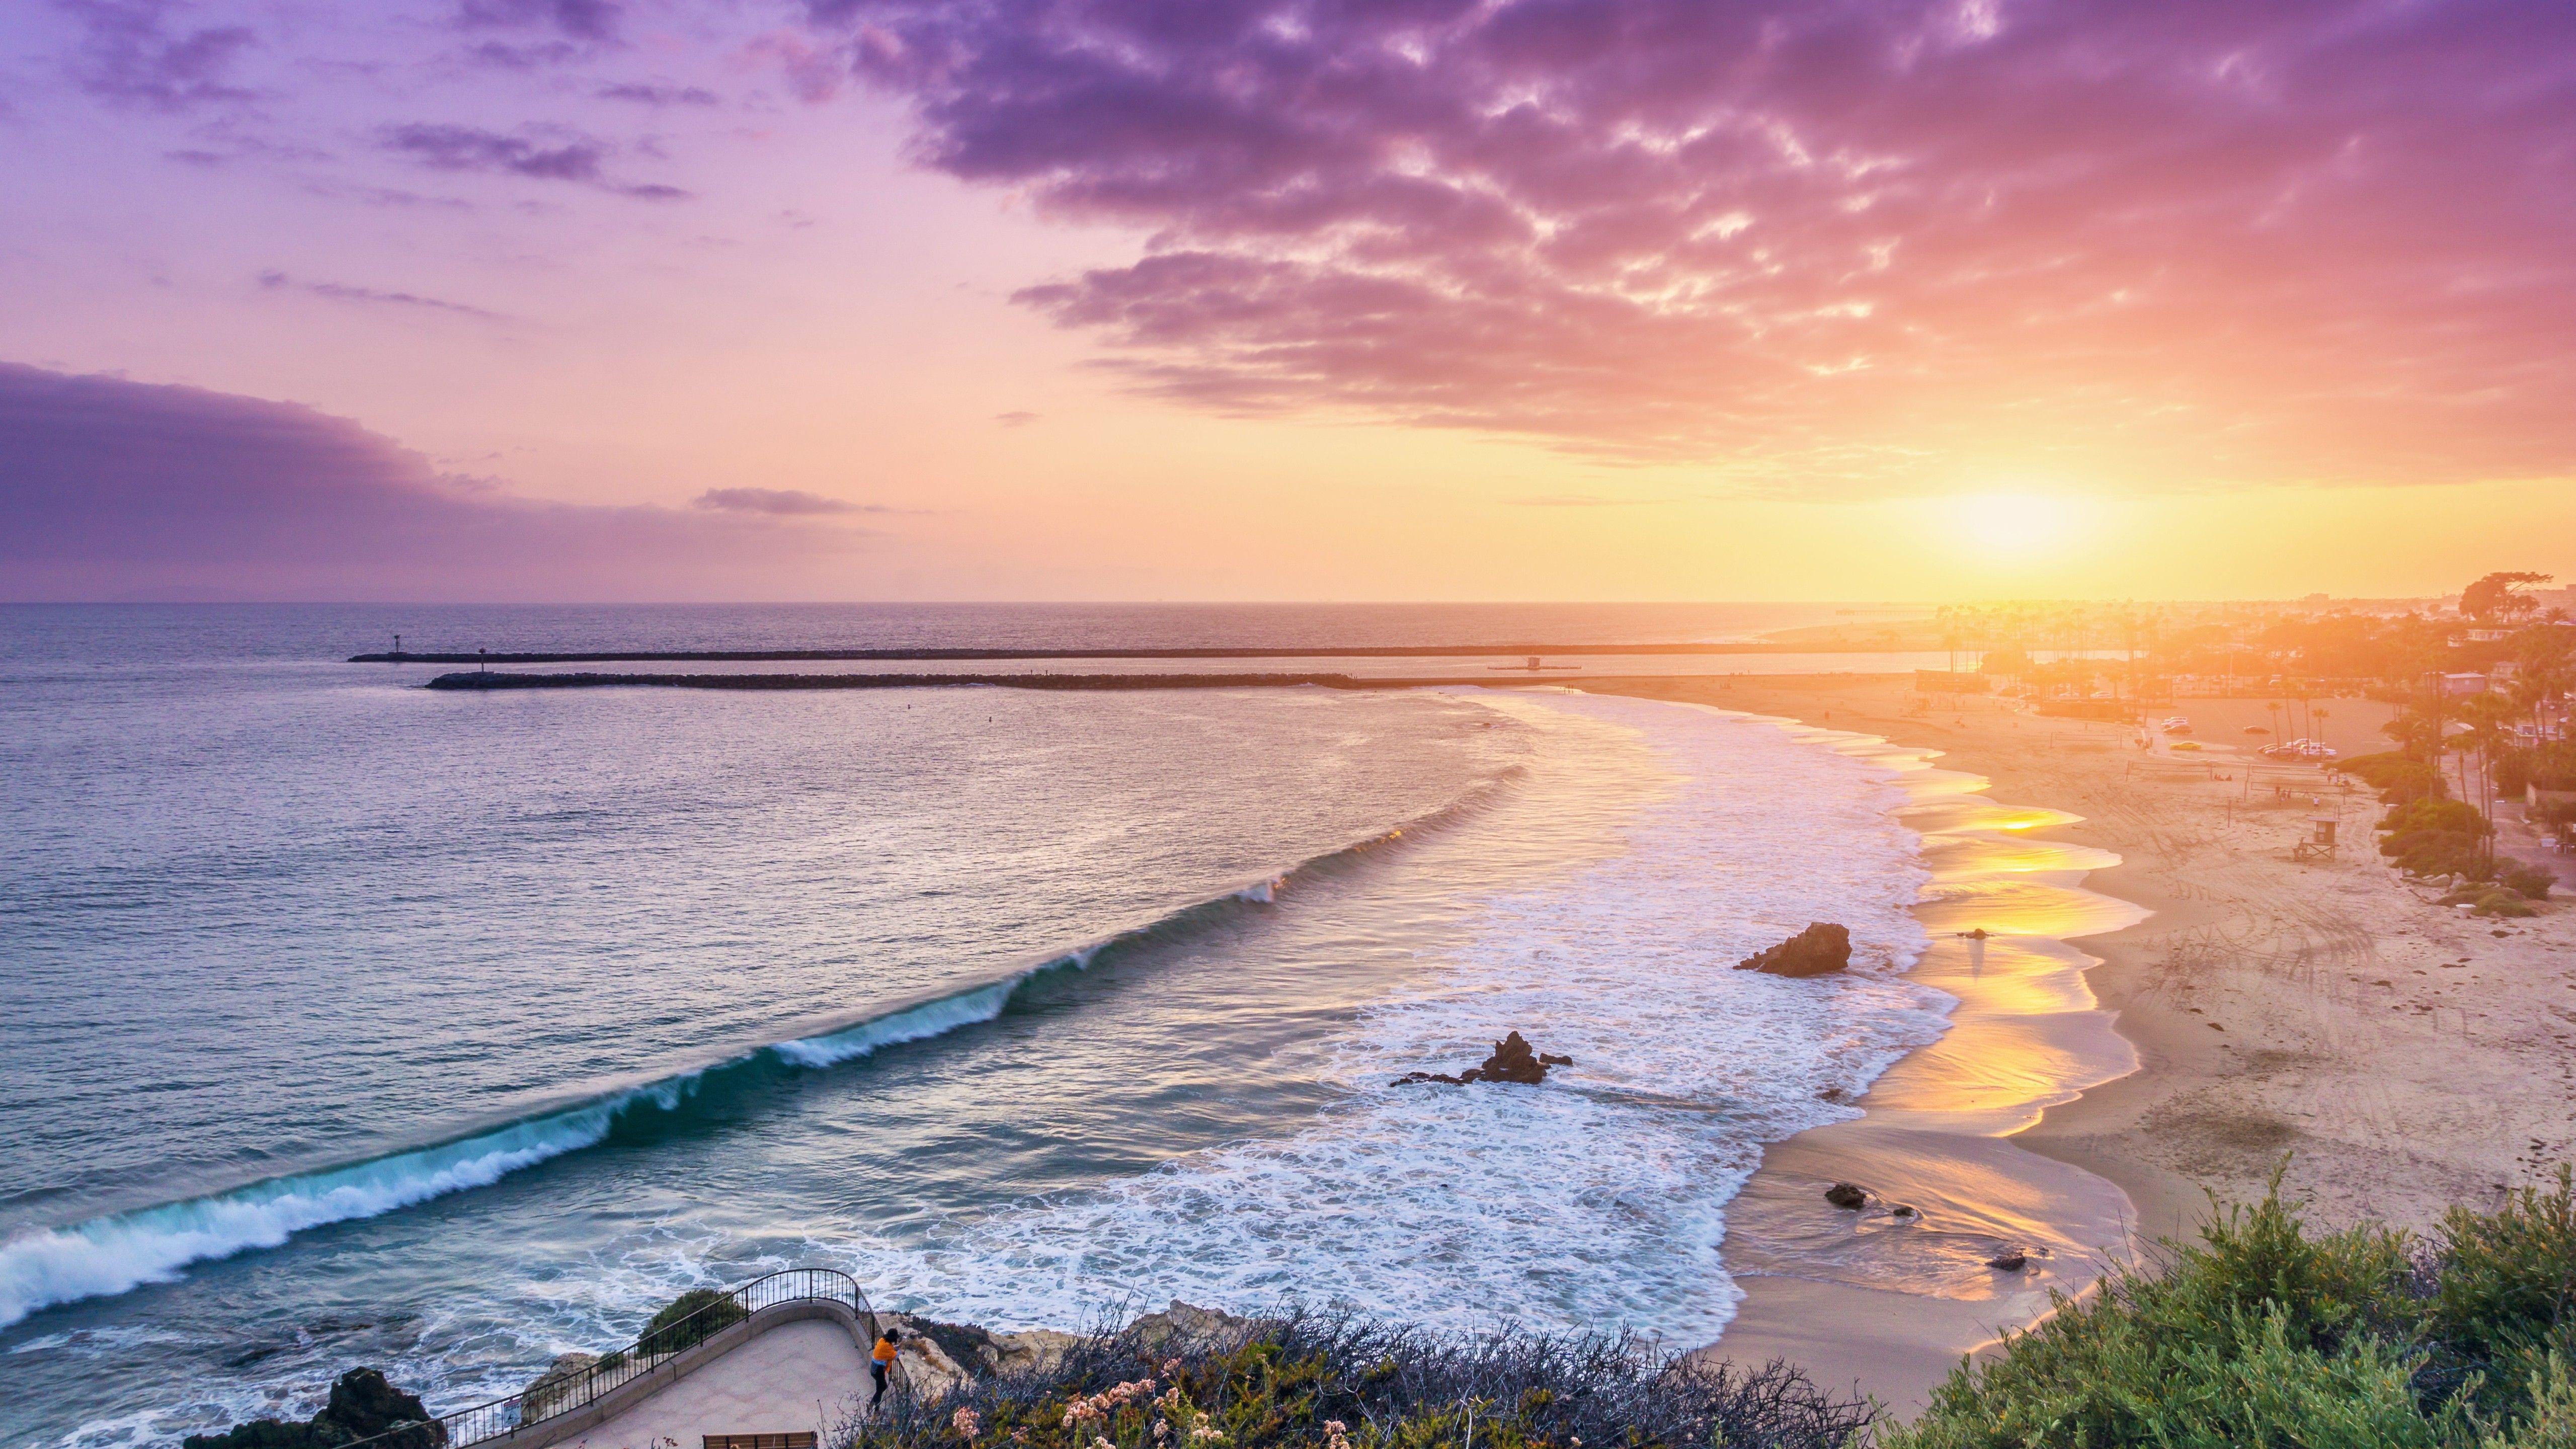 70 For My Beach HD Desktop Wallpapers   Download at WallpaperBro 5120x2880